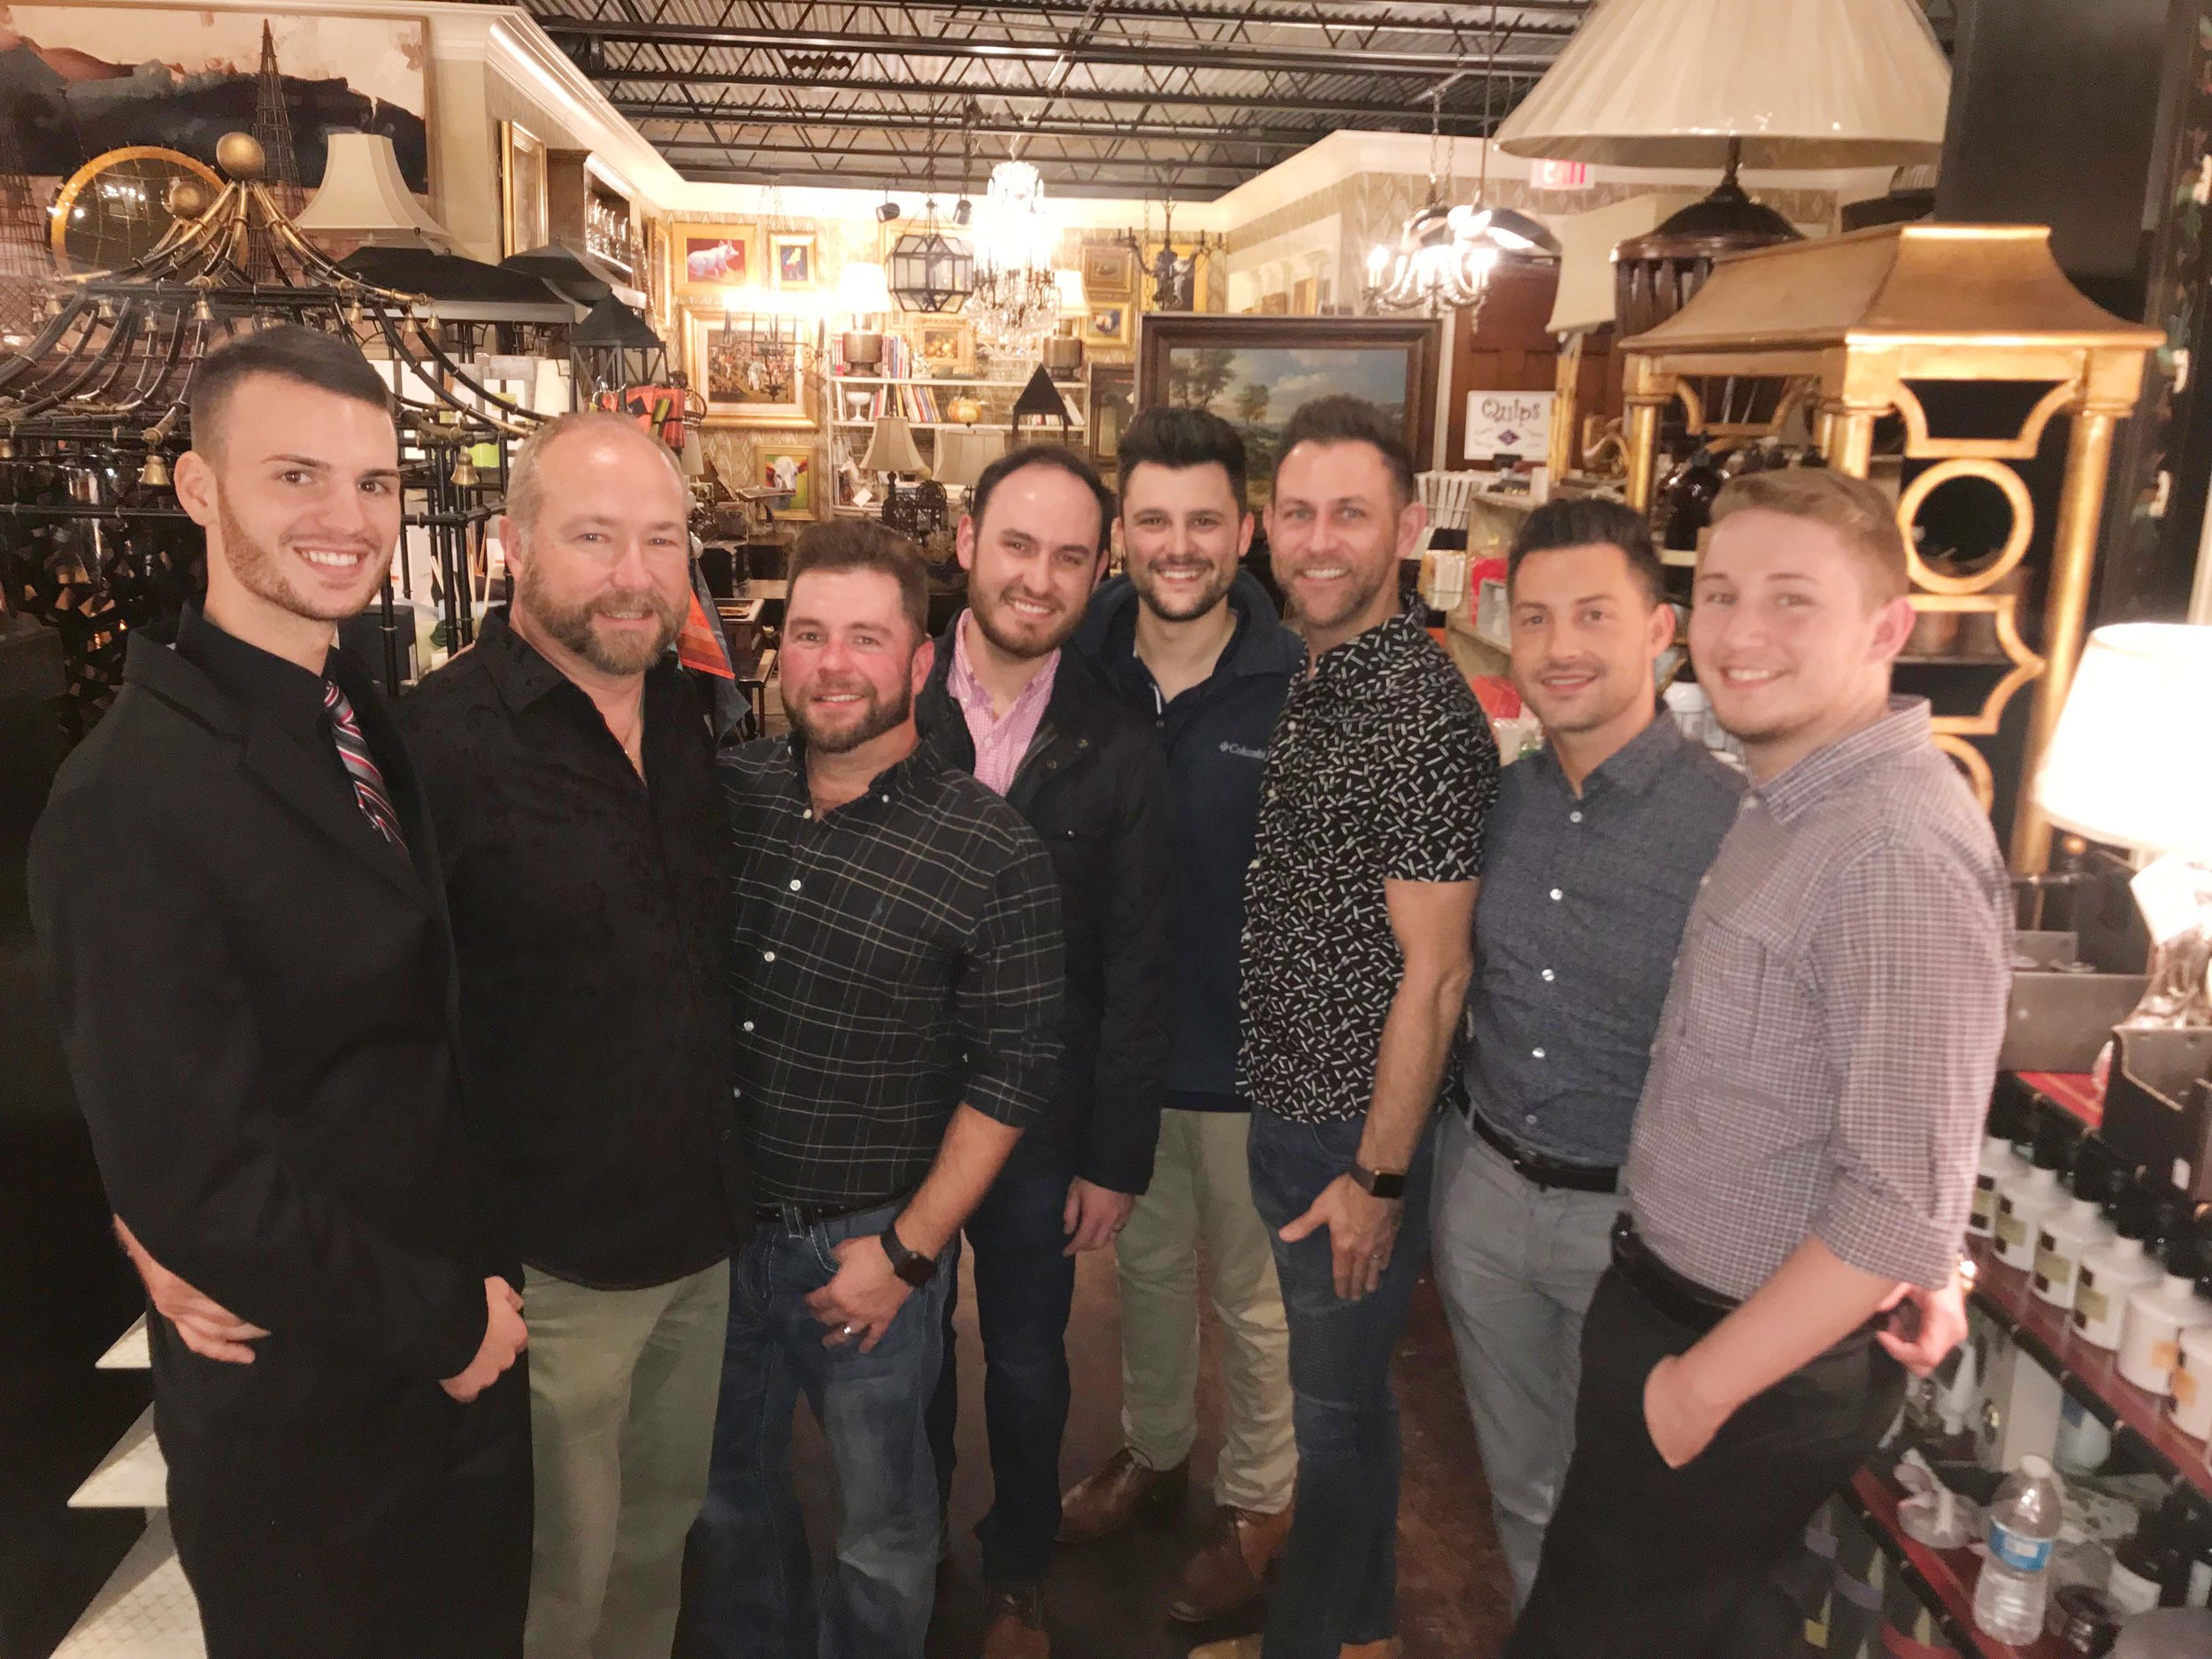 Caleb Scott, Mark Missildine, Guy Wilbanks, Chase Powell, Michael Stephenson, Jay Hoy, Brandon Dixon and Lucas Sullivan